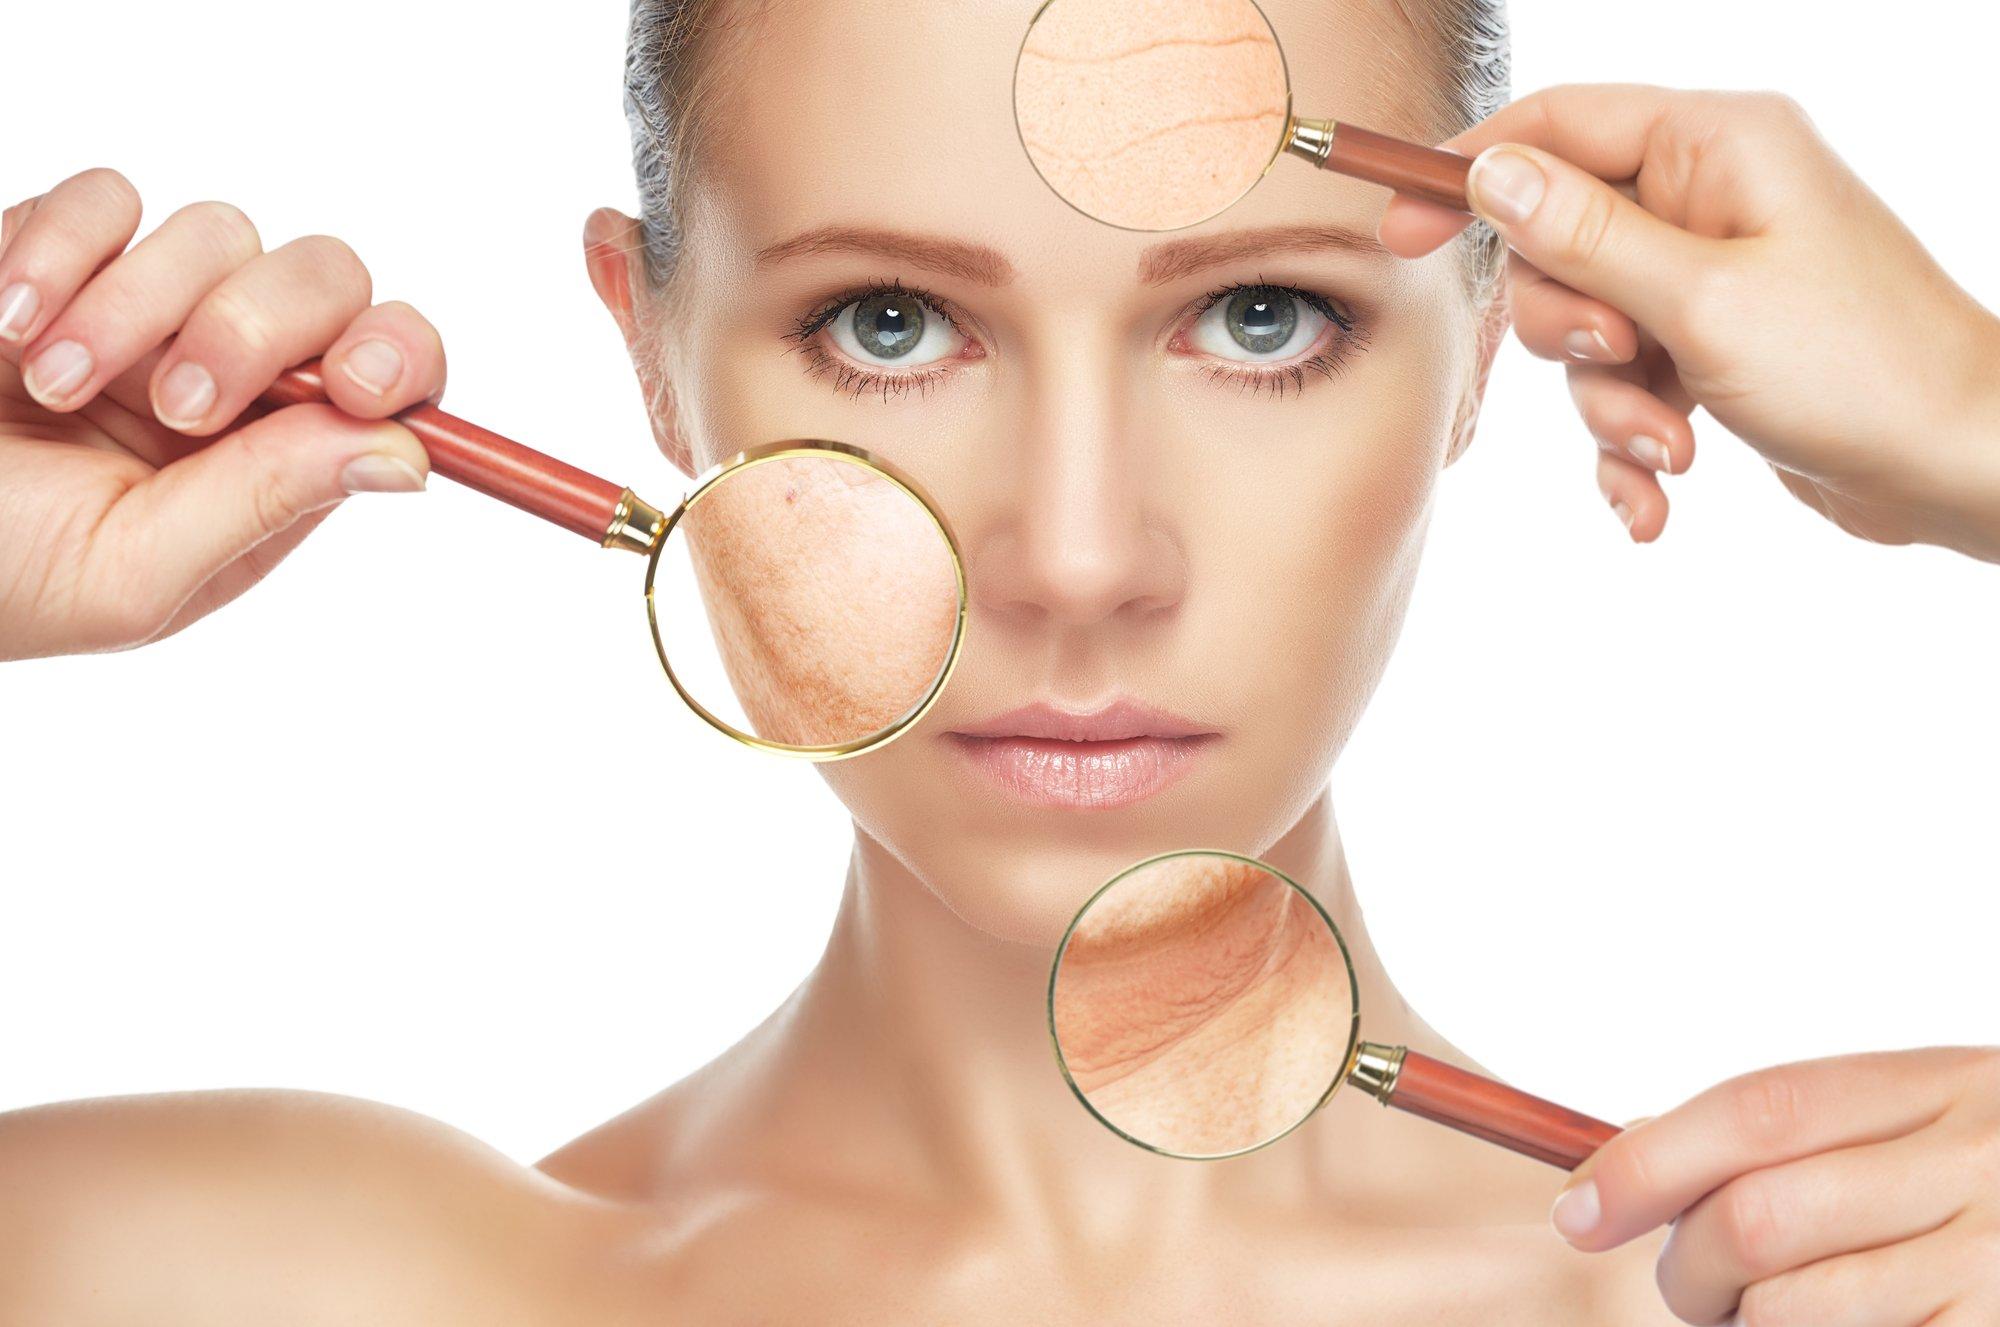 5 Surprisingly Effective Home Remedies to Tighten Skin